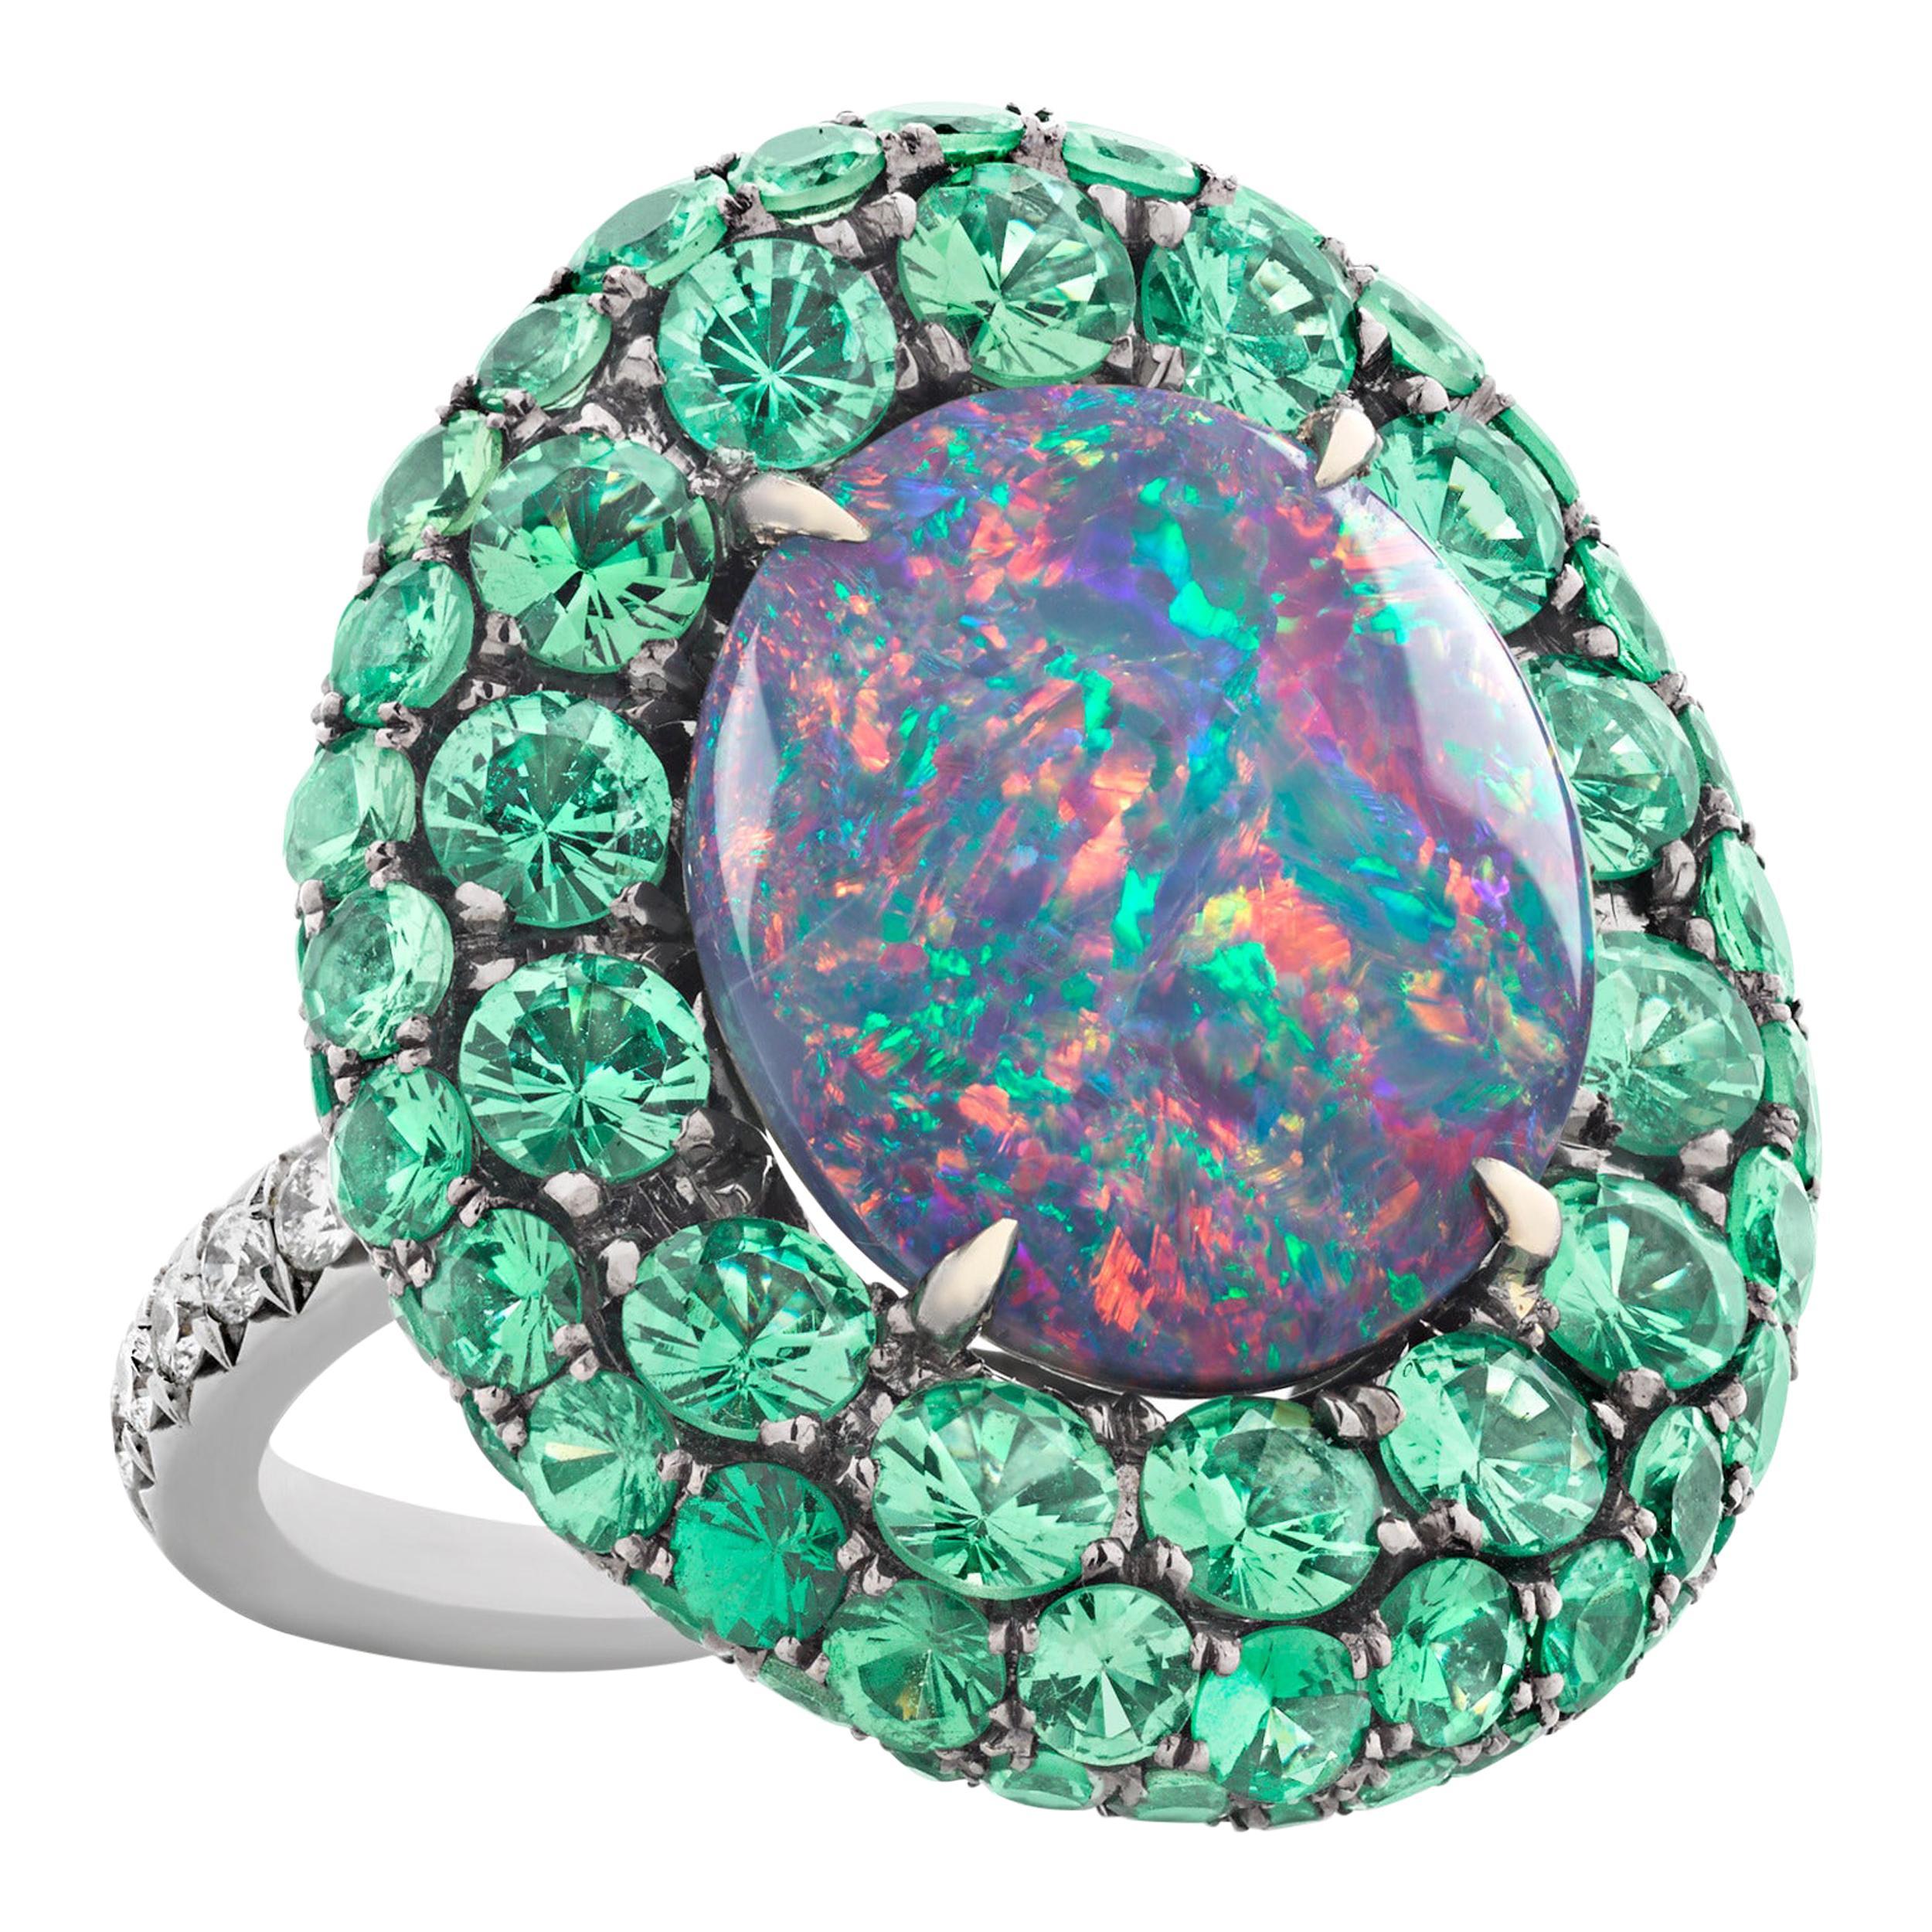 Black Opal and Tsavorite Garnet Ring, 5.83 Carat